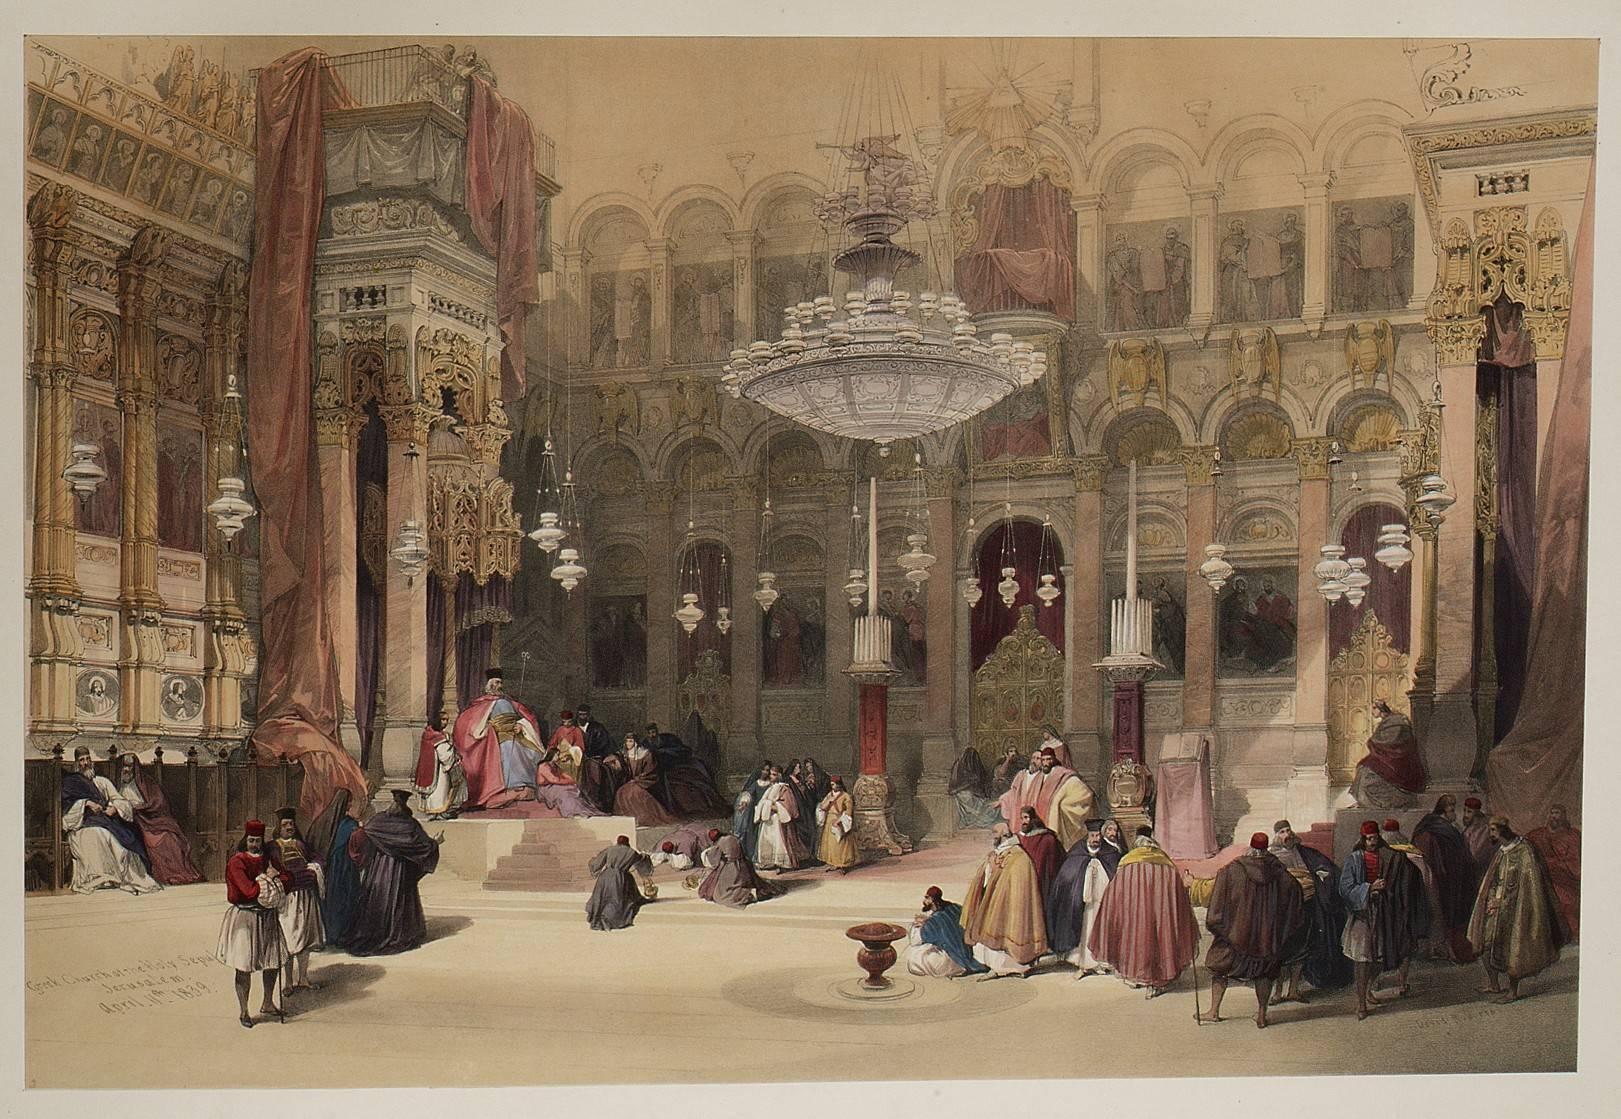 The Holy Land, Syria, Idumea, Arabia, Egypt & Nubia (David Roberts / The MET)